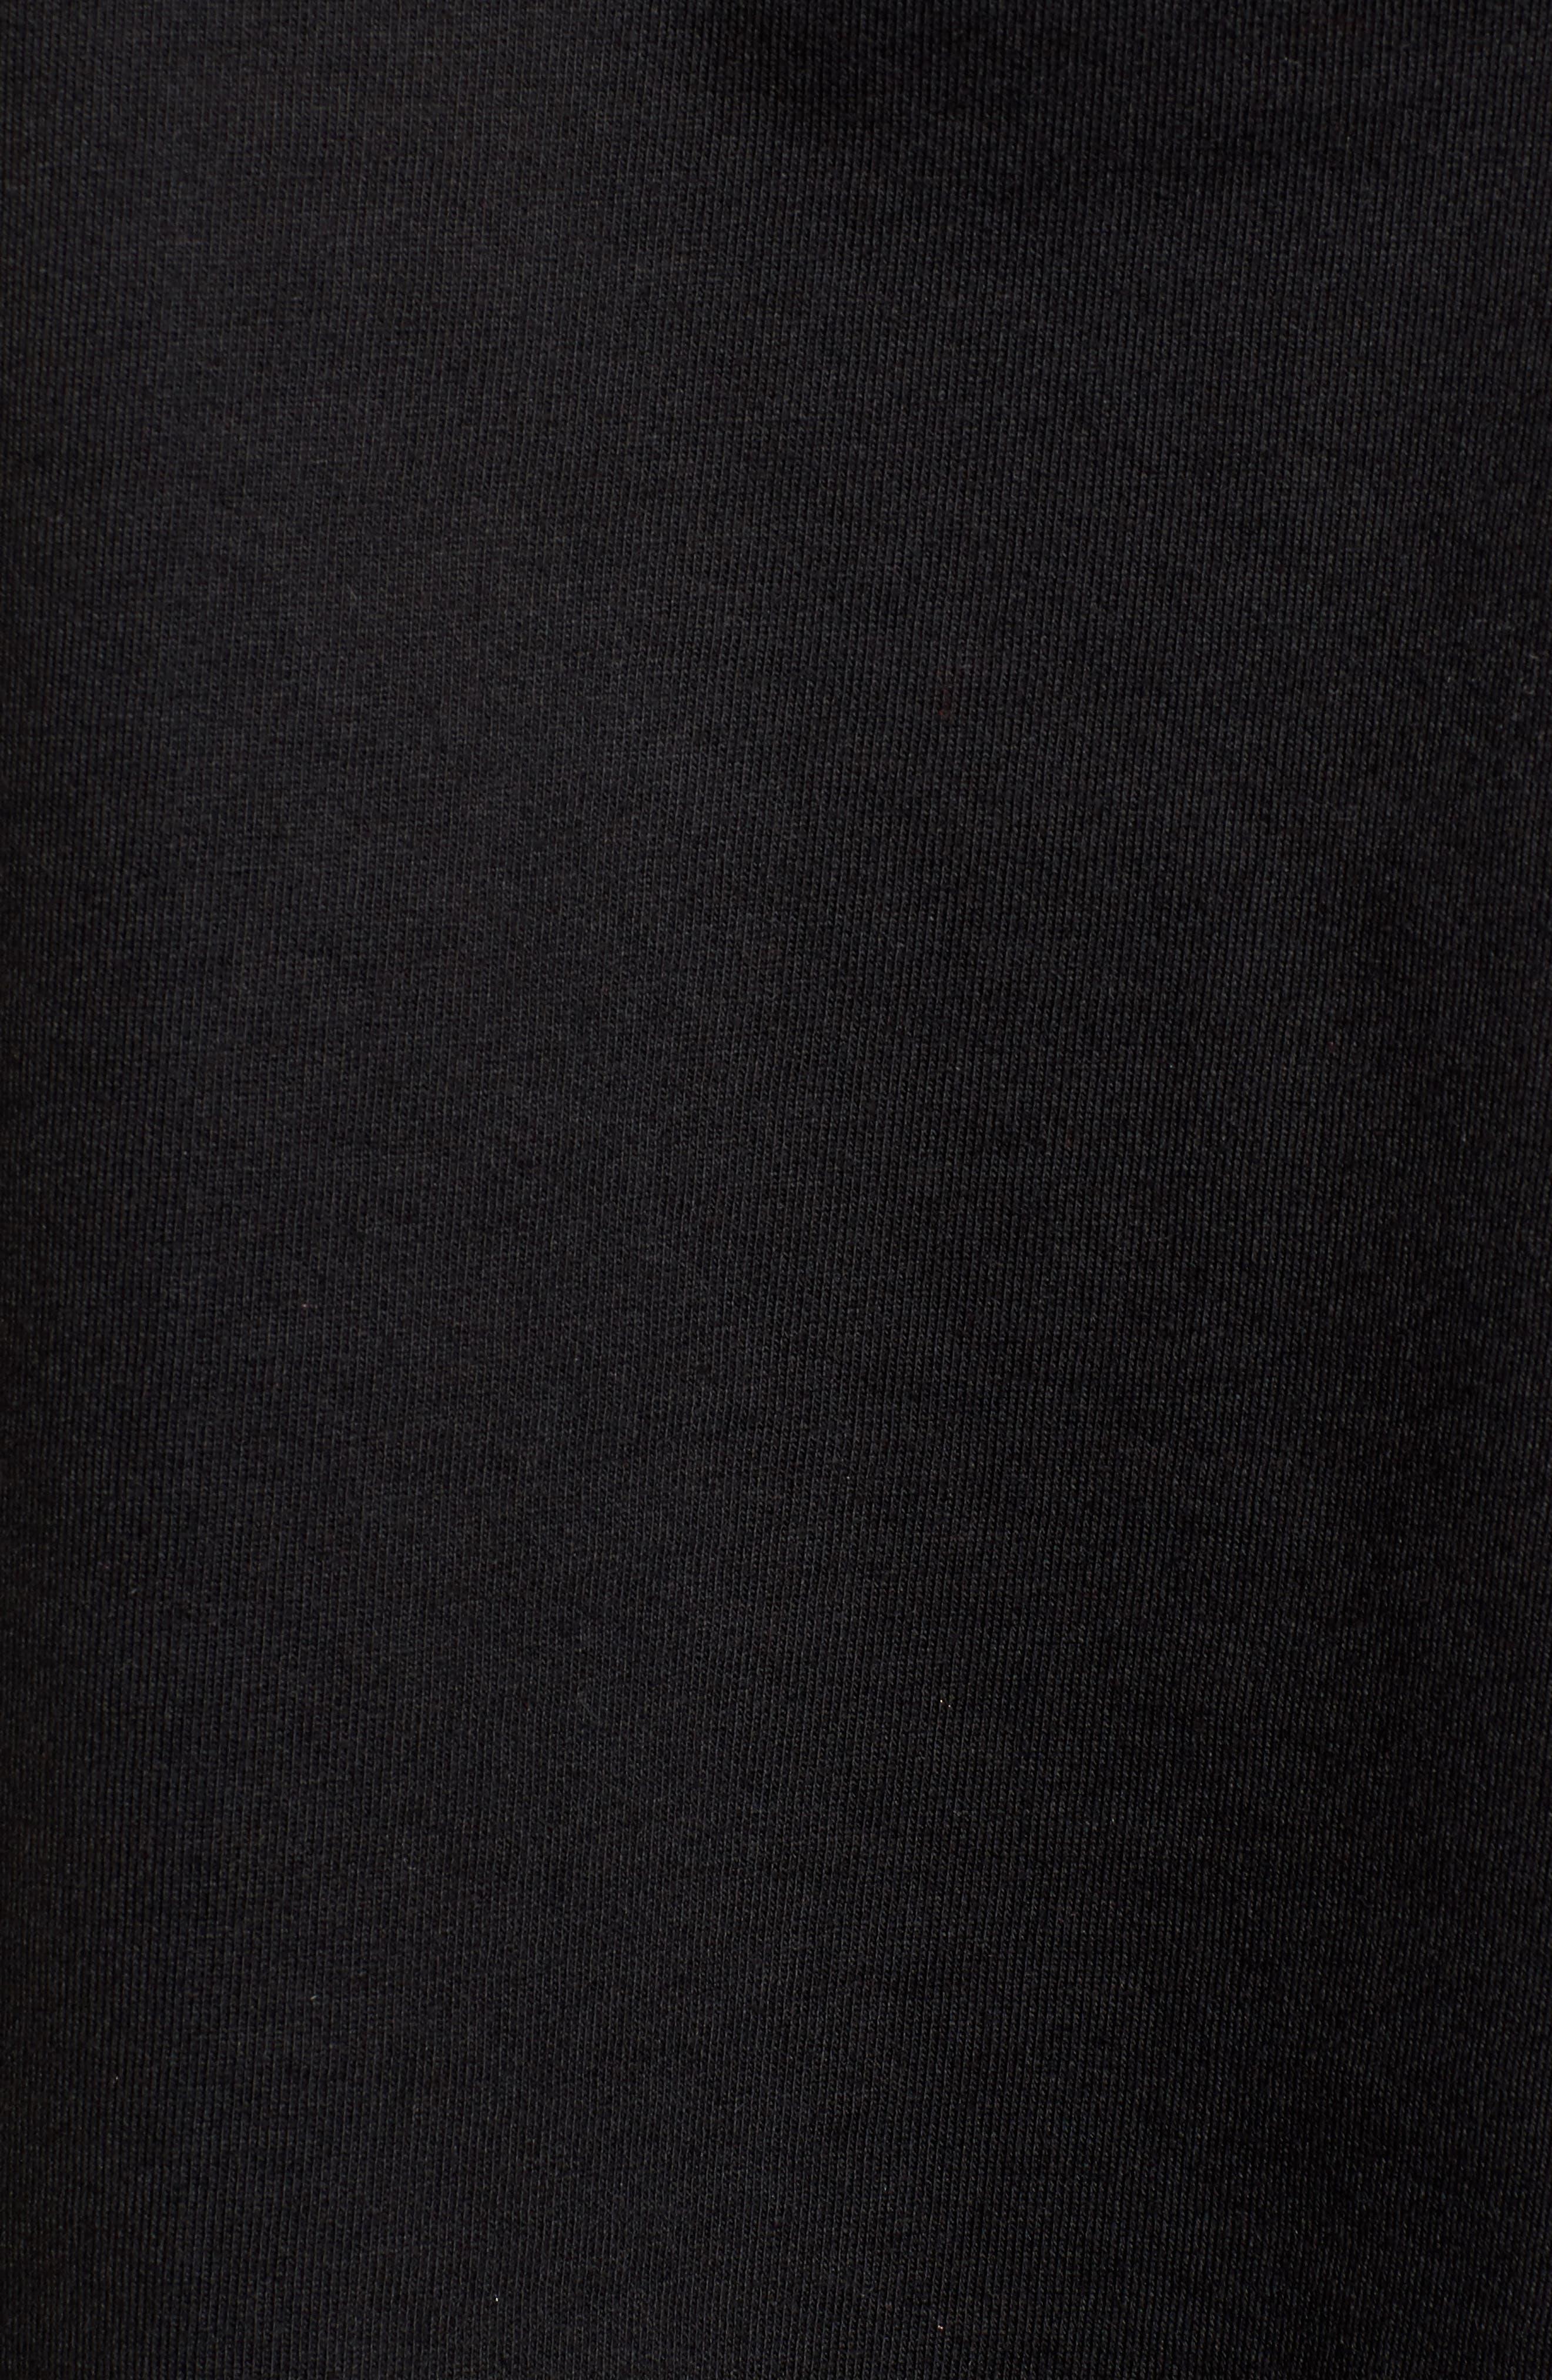 Carlisle Embroidered Sweatshirt,                             Alternate thumbnail 5, color,                             BLACK